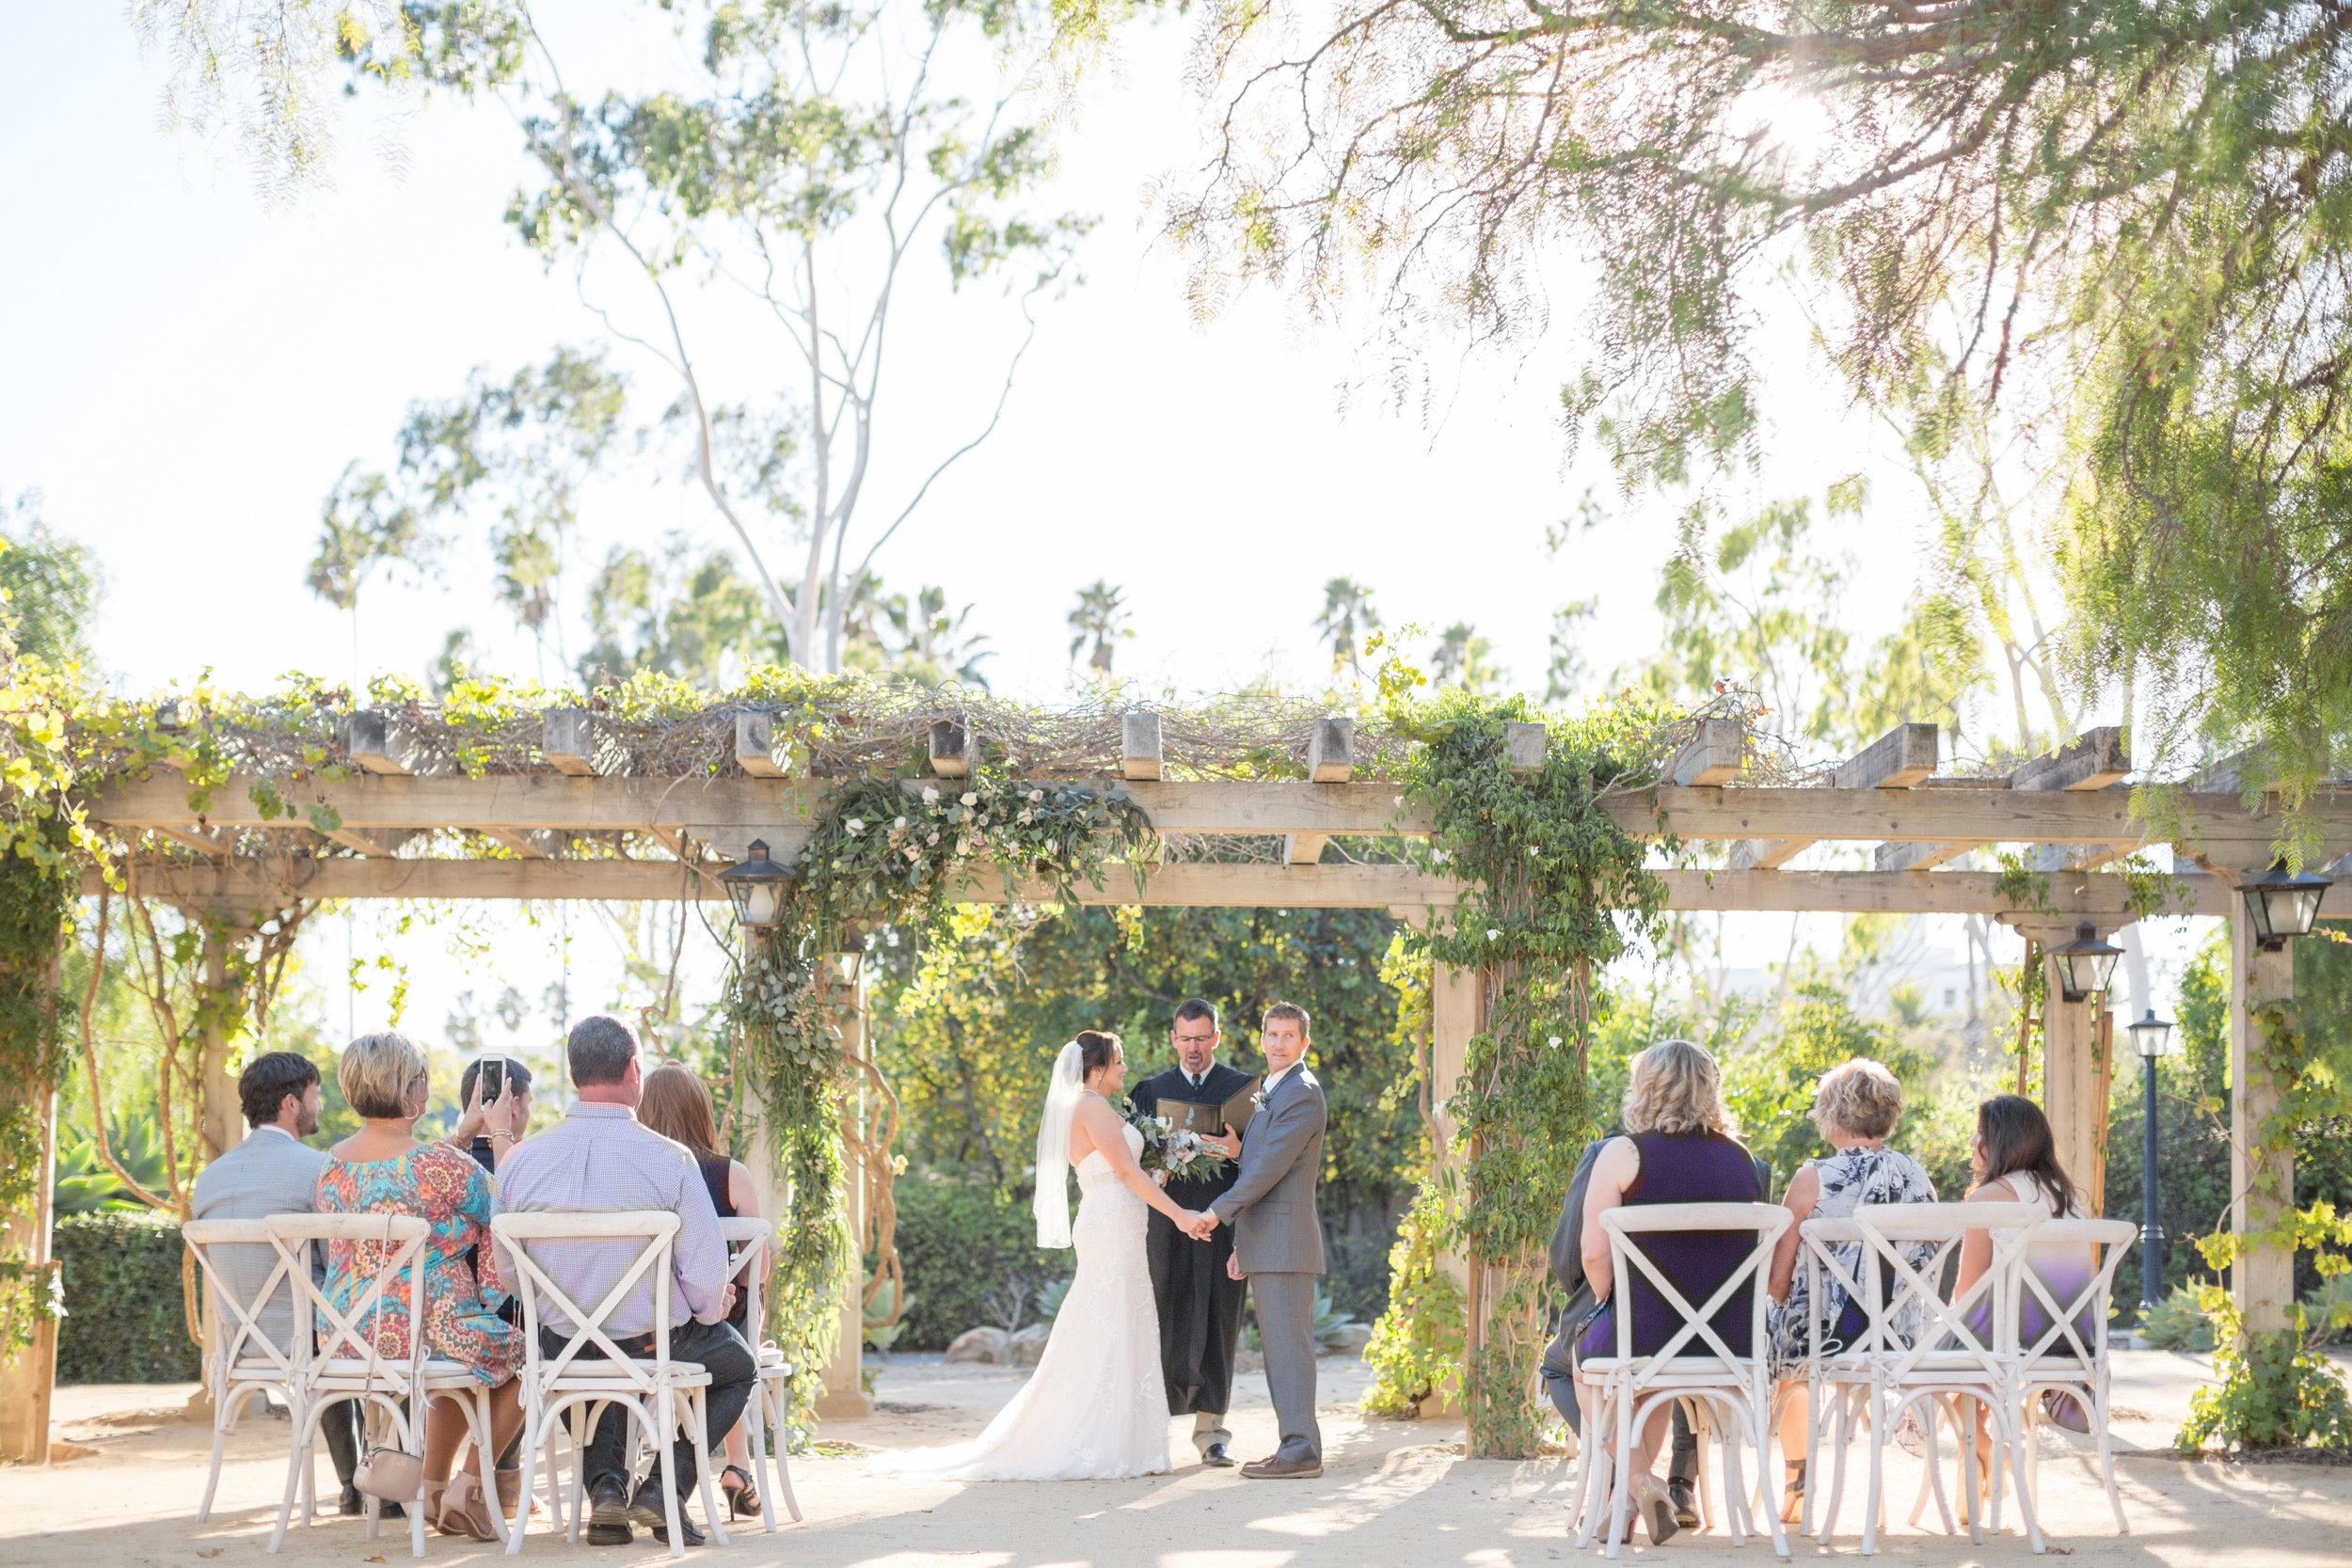 santa-barbara-elopement-wedding-planner-intimate-historical-museum-downtown-courtyard-arbor-purple-succulent (1).jpg